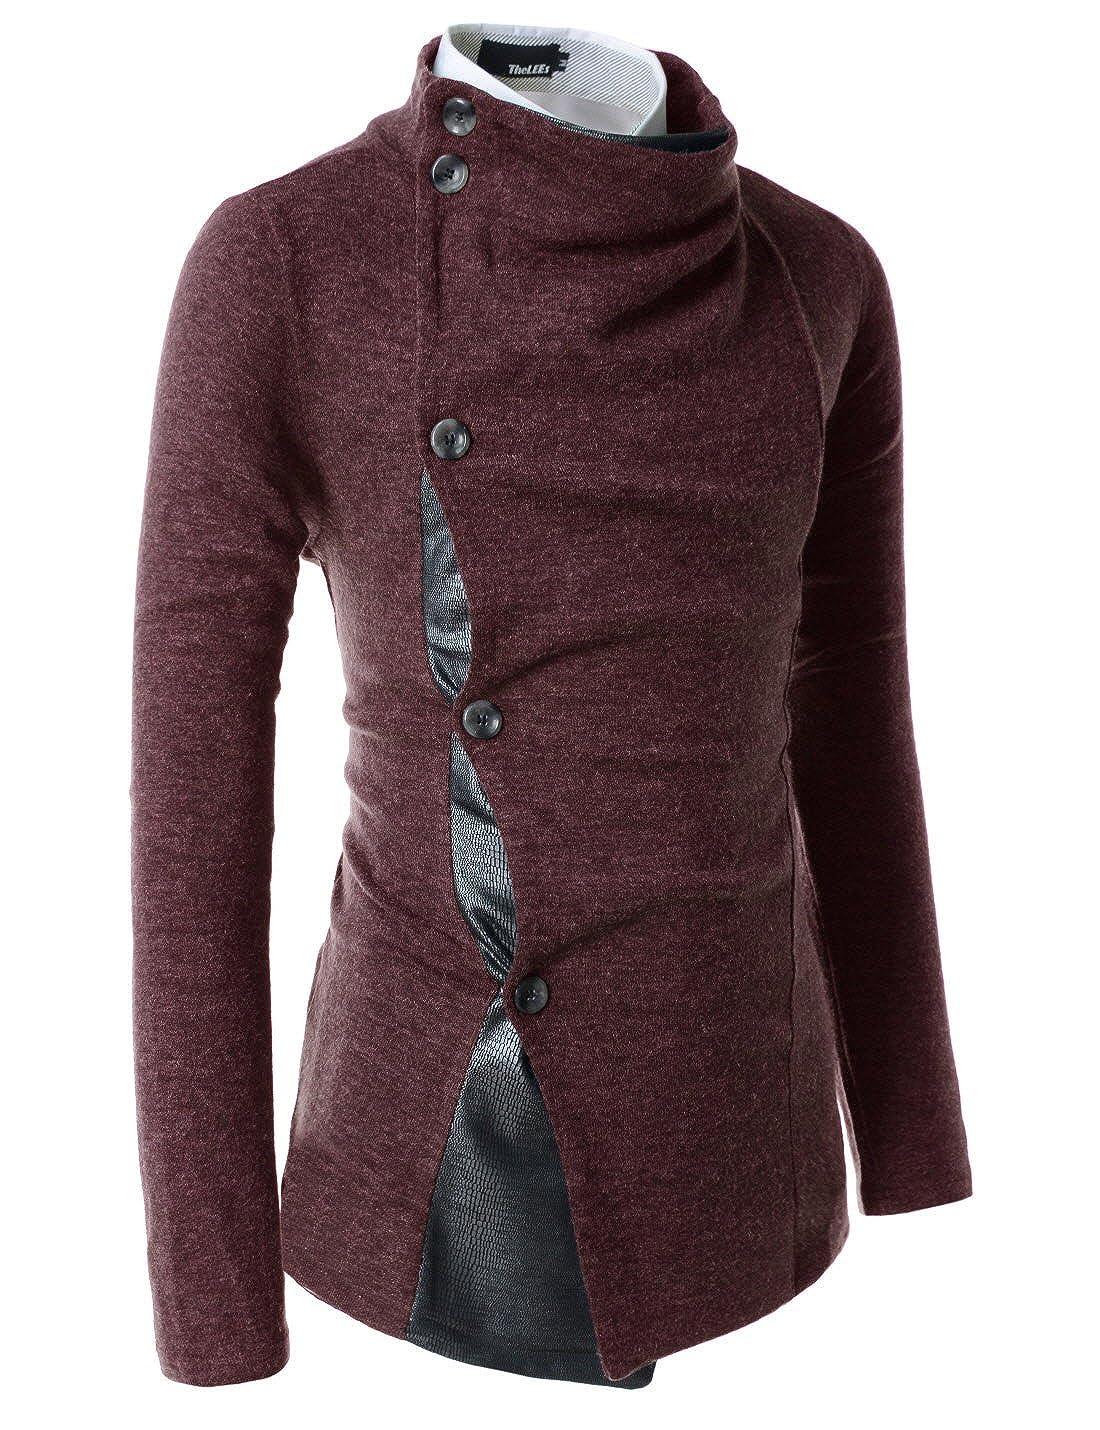 (GD93) Slim Stylish Unbalanced Metallic Leather Point Knitted Cardigan Sweaters